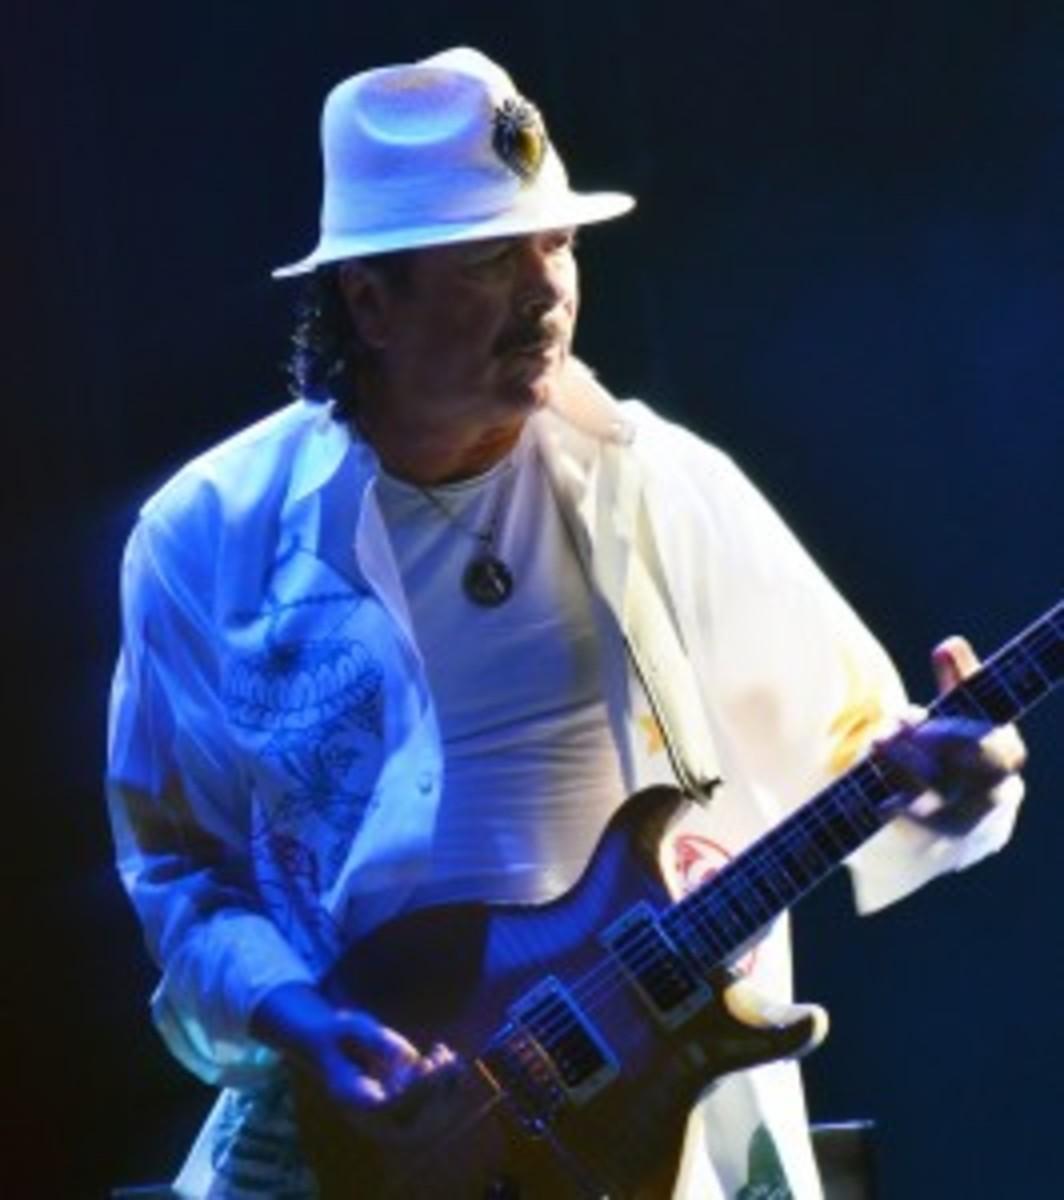 Carlos Santana performs July 20 at The Borgata in Atlantic City, N.J. (Photo by Chris M. Junior)